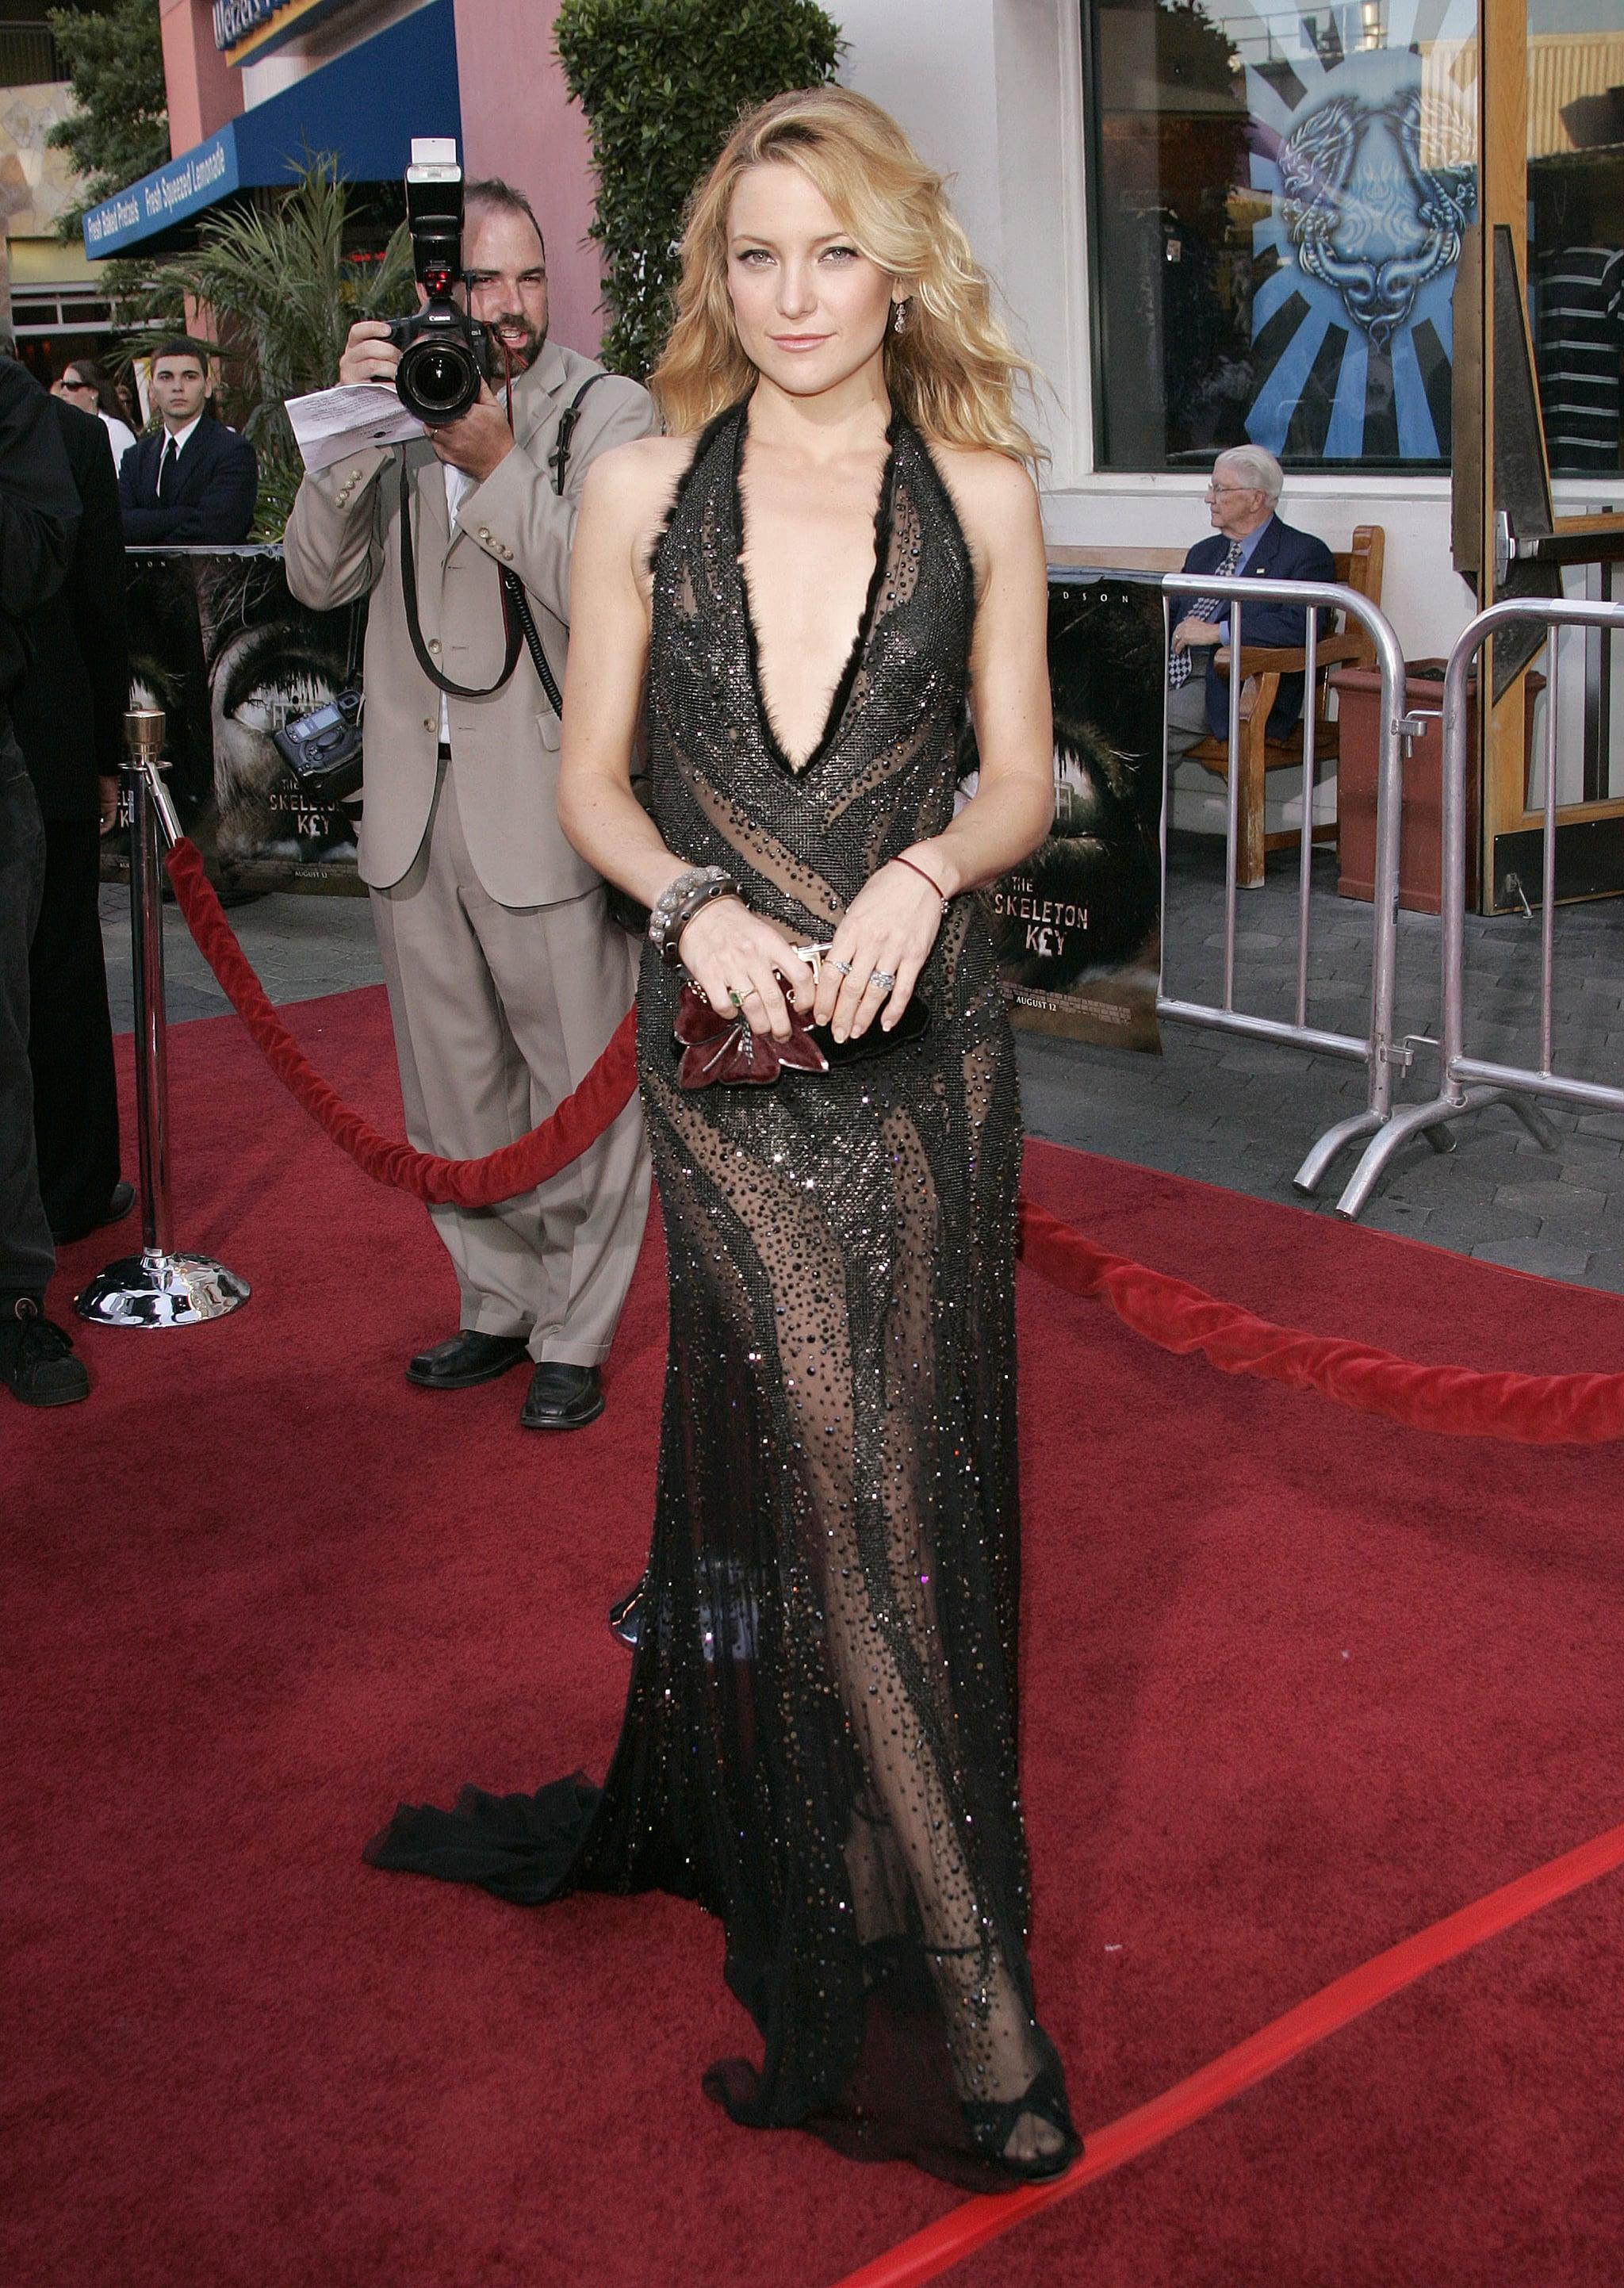 Kate Hudson in Versace at the Skeleton Key Premiere